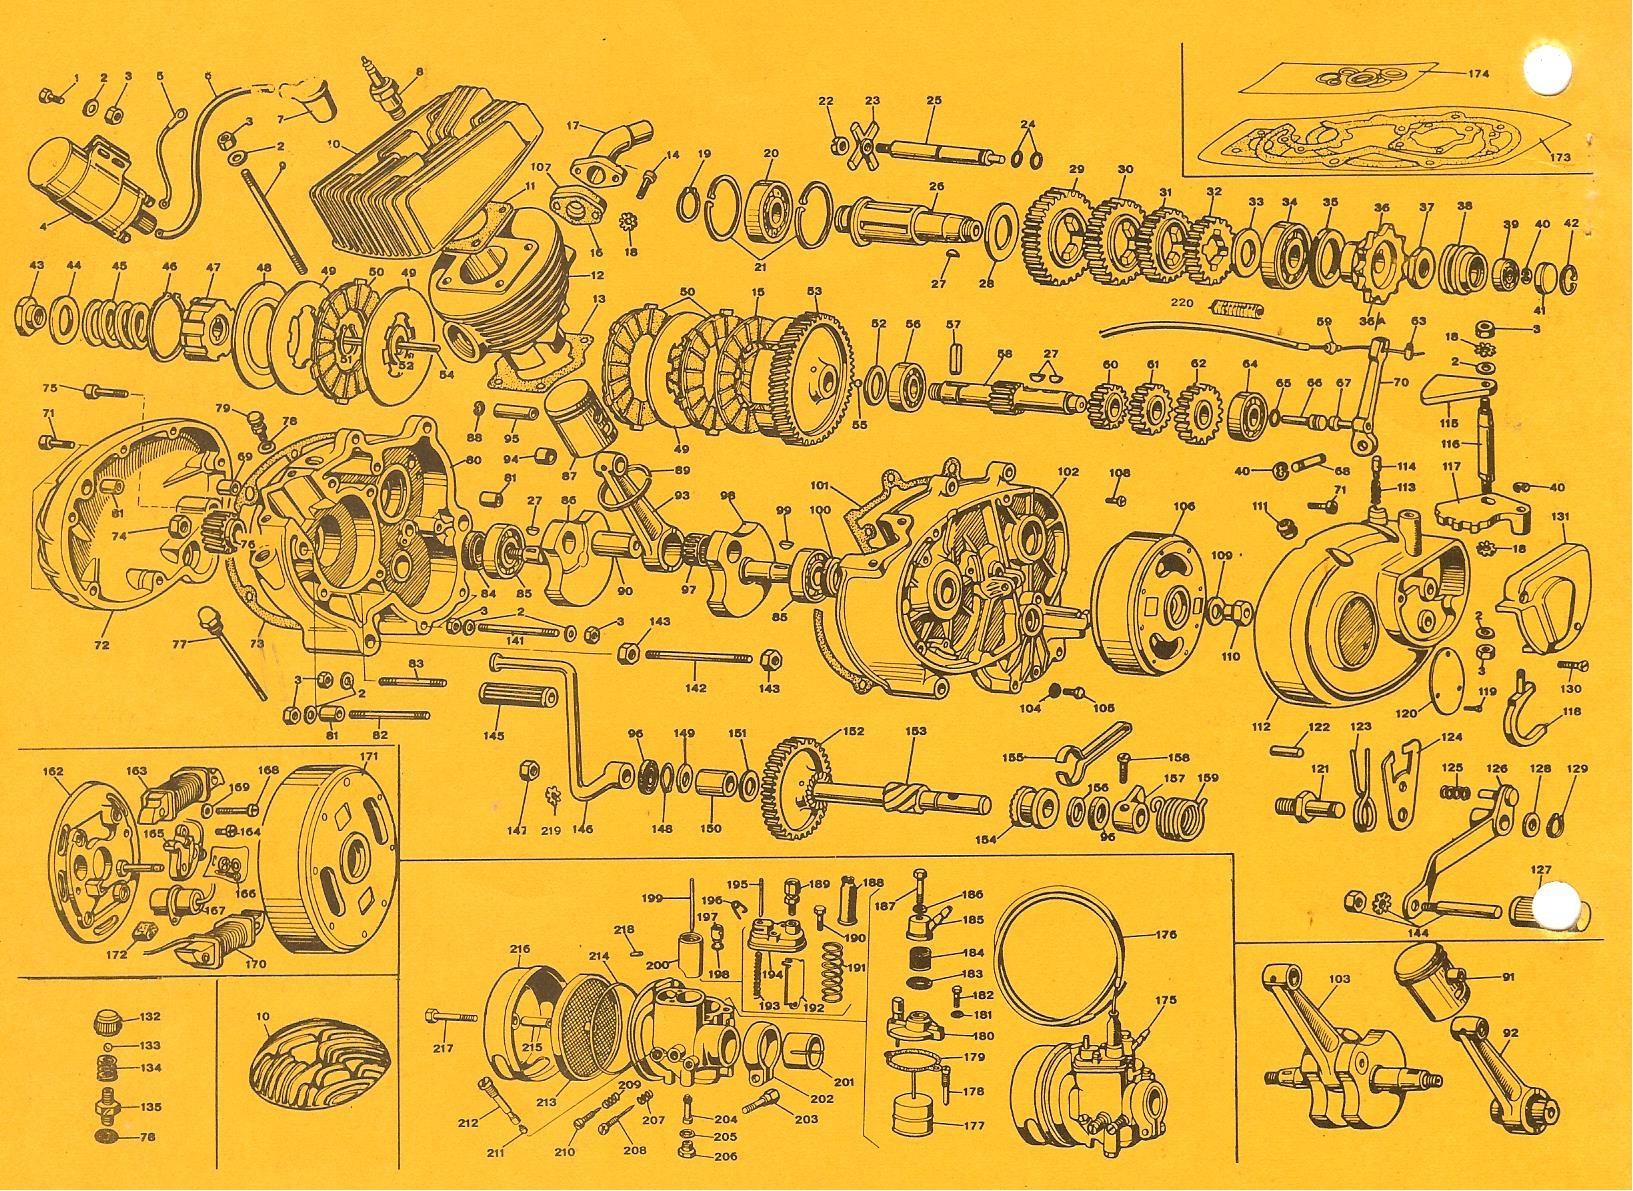 1998 yamaha atv wiring diagram, 1998 yamaha atv wiring diagram #11 also 1998 yamaha atv wiring diagram #11